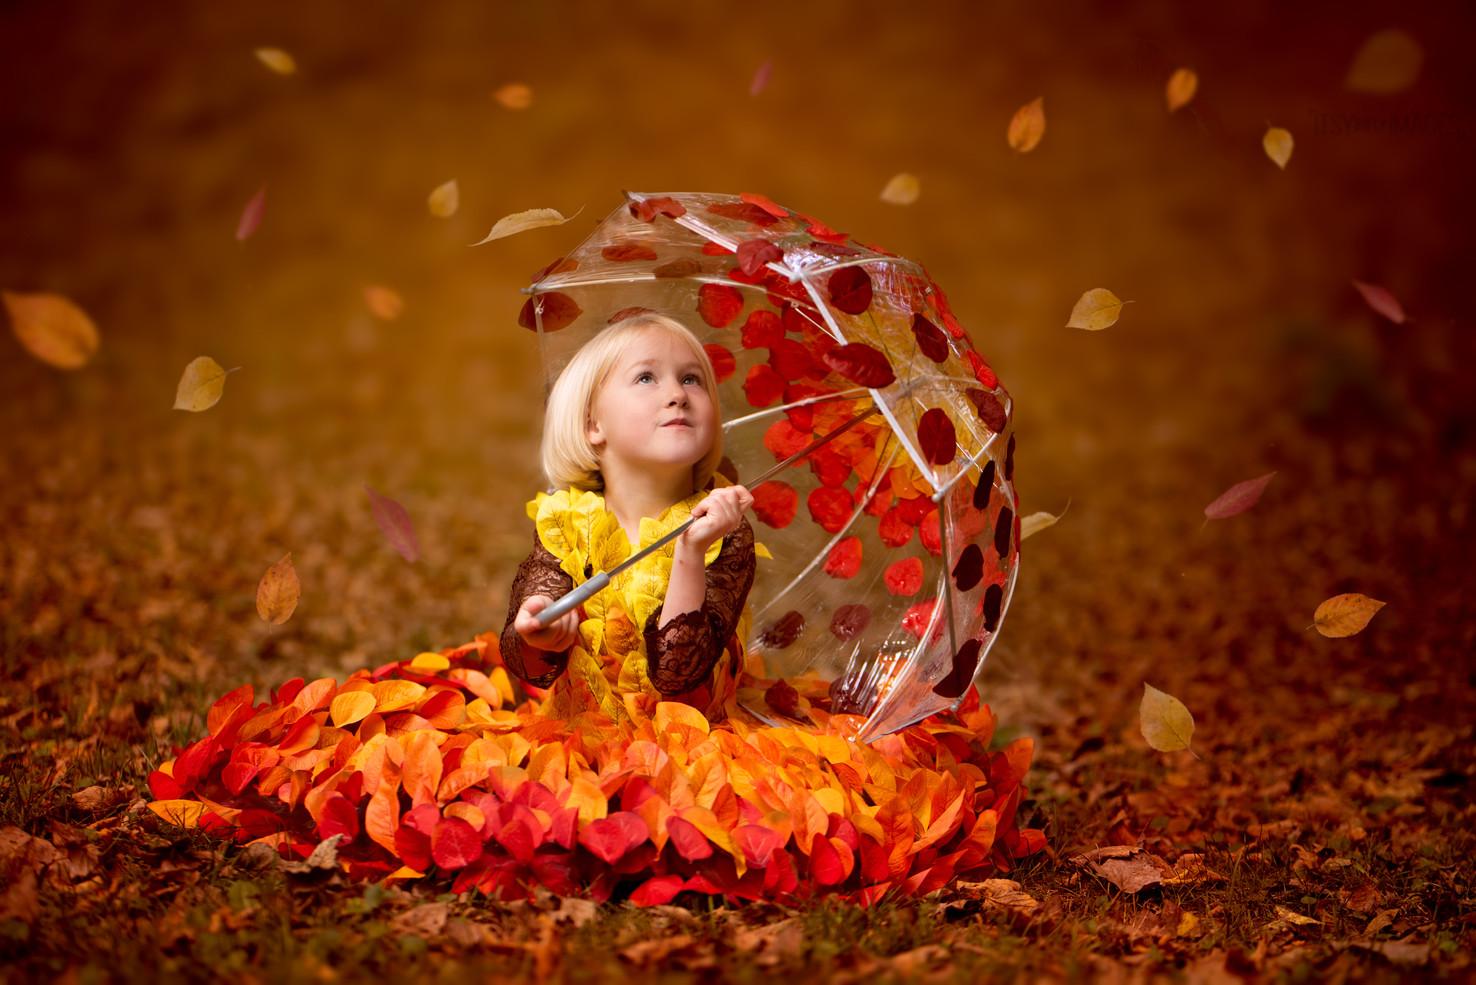 Fall Leaves Dress and Umbrella